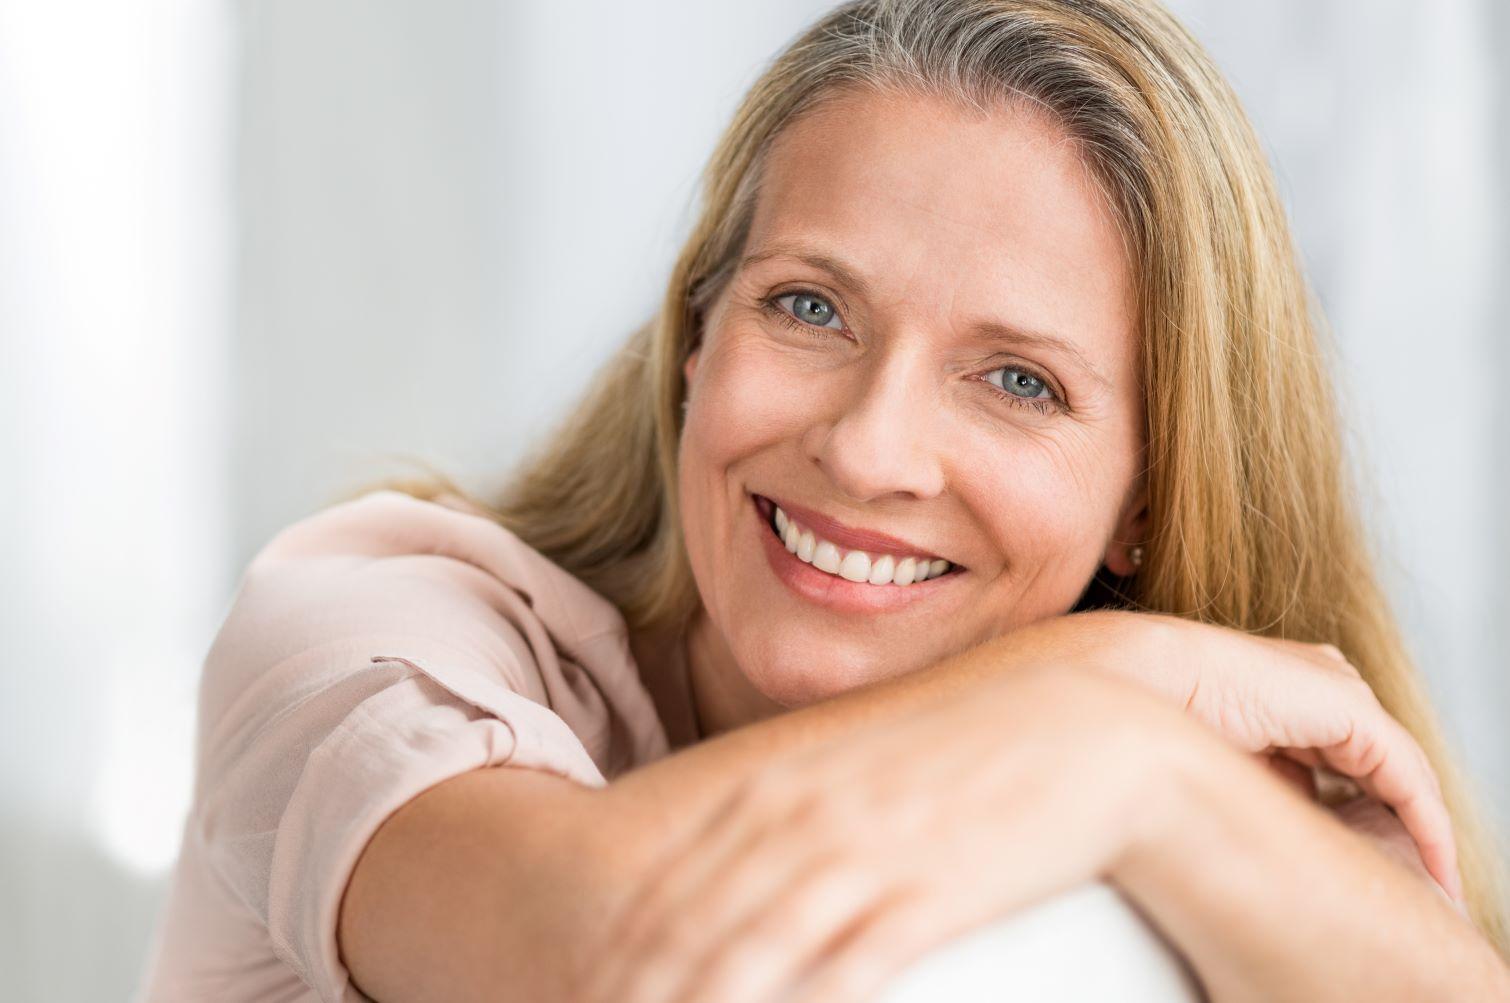 woman smiling - what is a dental bridge